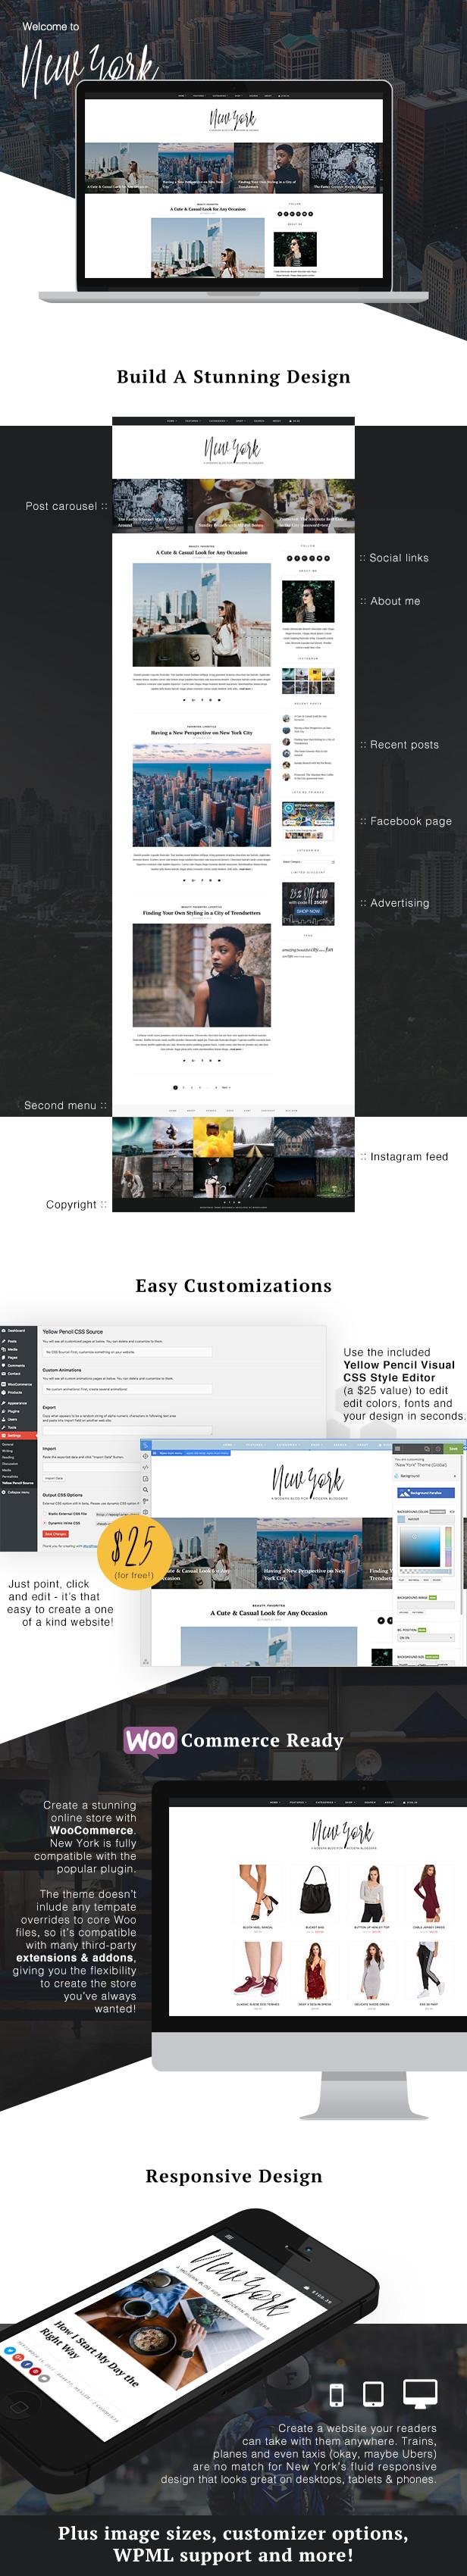 New York WordPress Template Funktionen